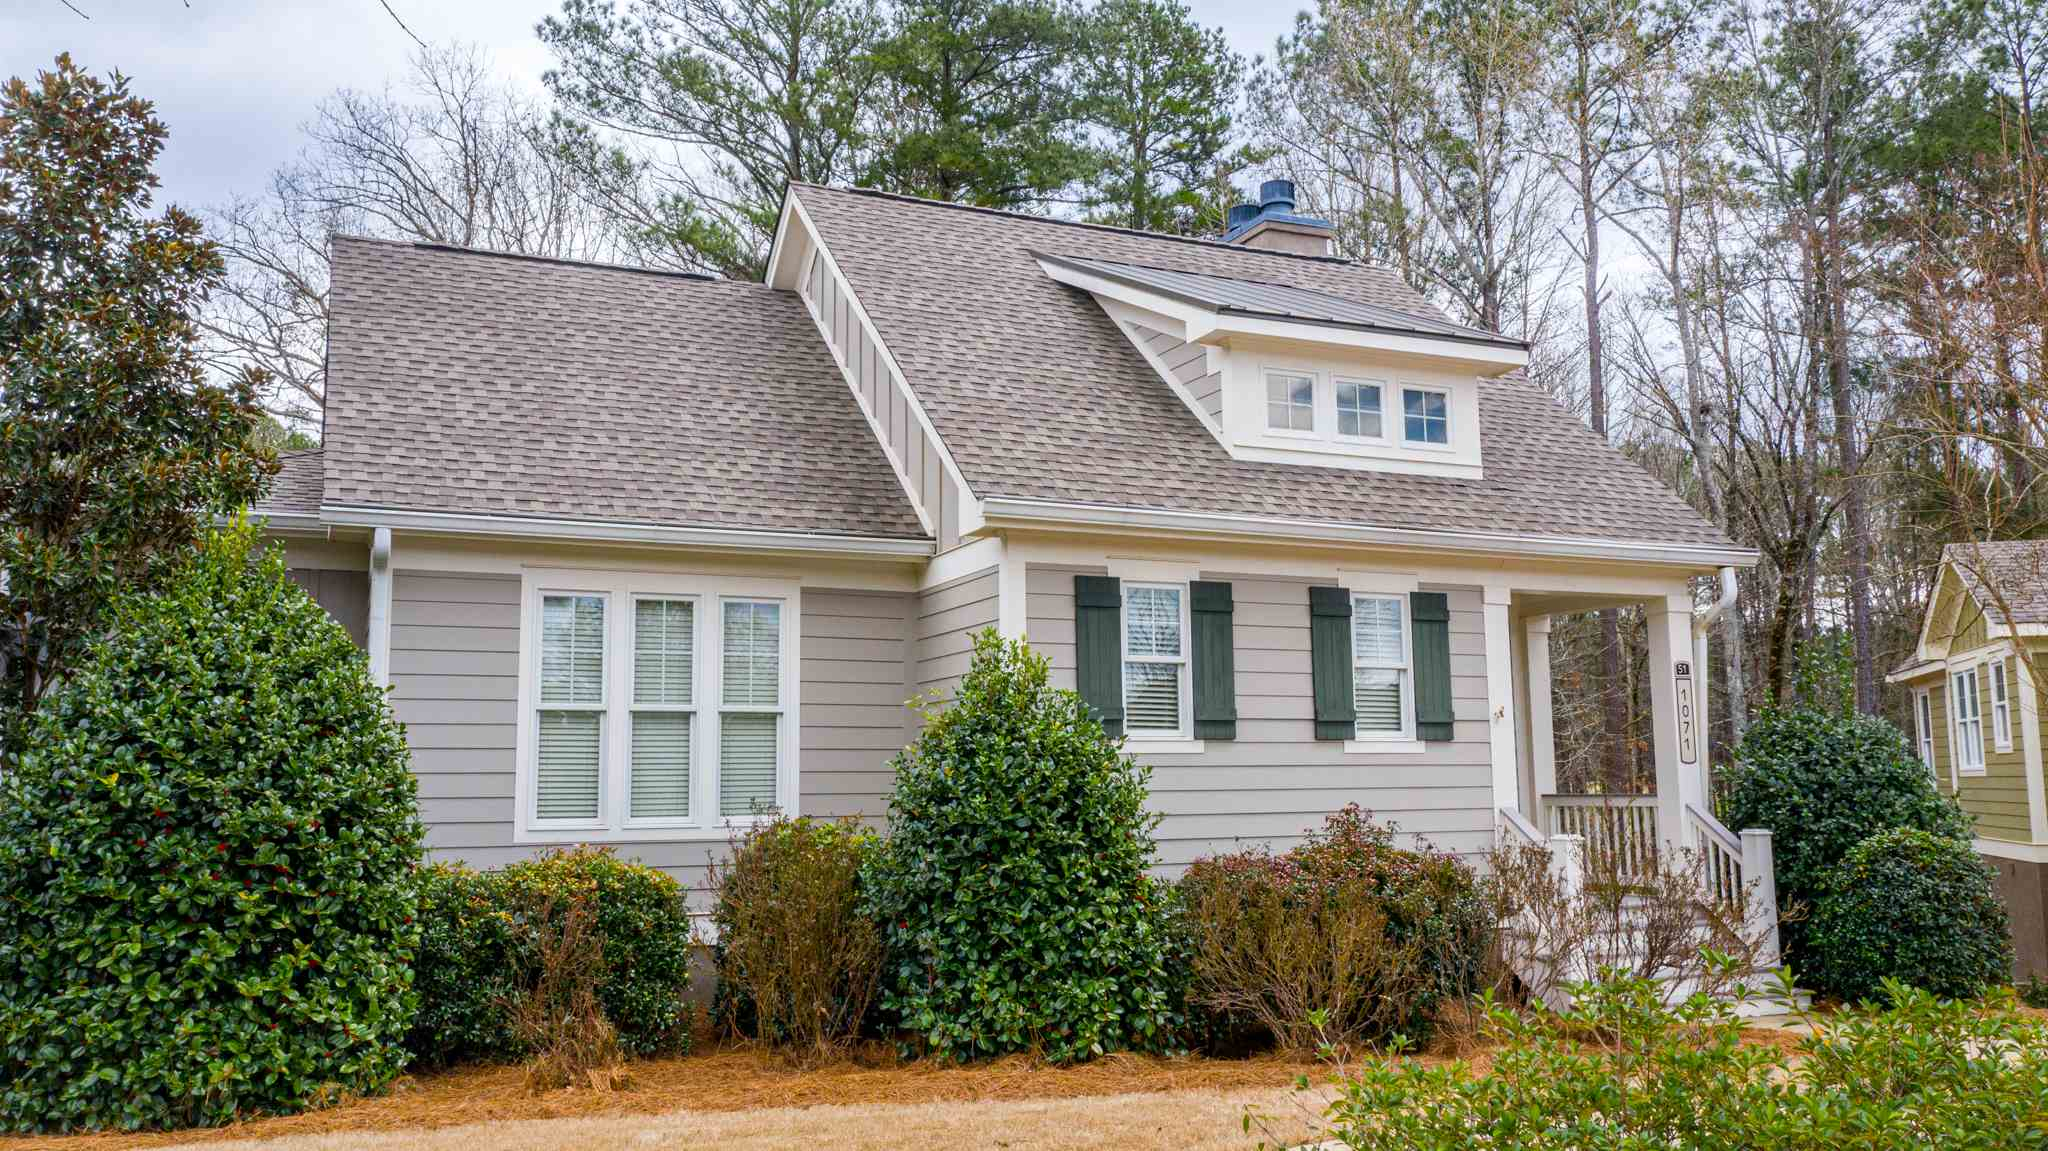 1071 PORCH VIEW ROAD, Lake Oconee Reynolds Landing in Greene County, GA 30642 Home for Sale